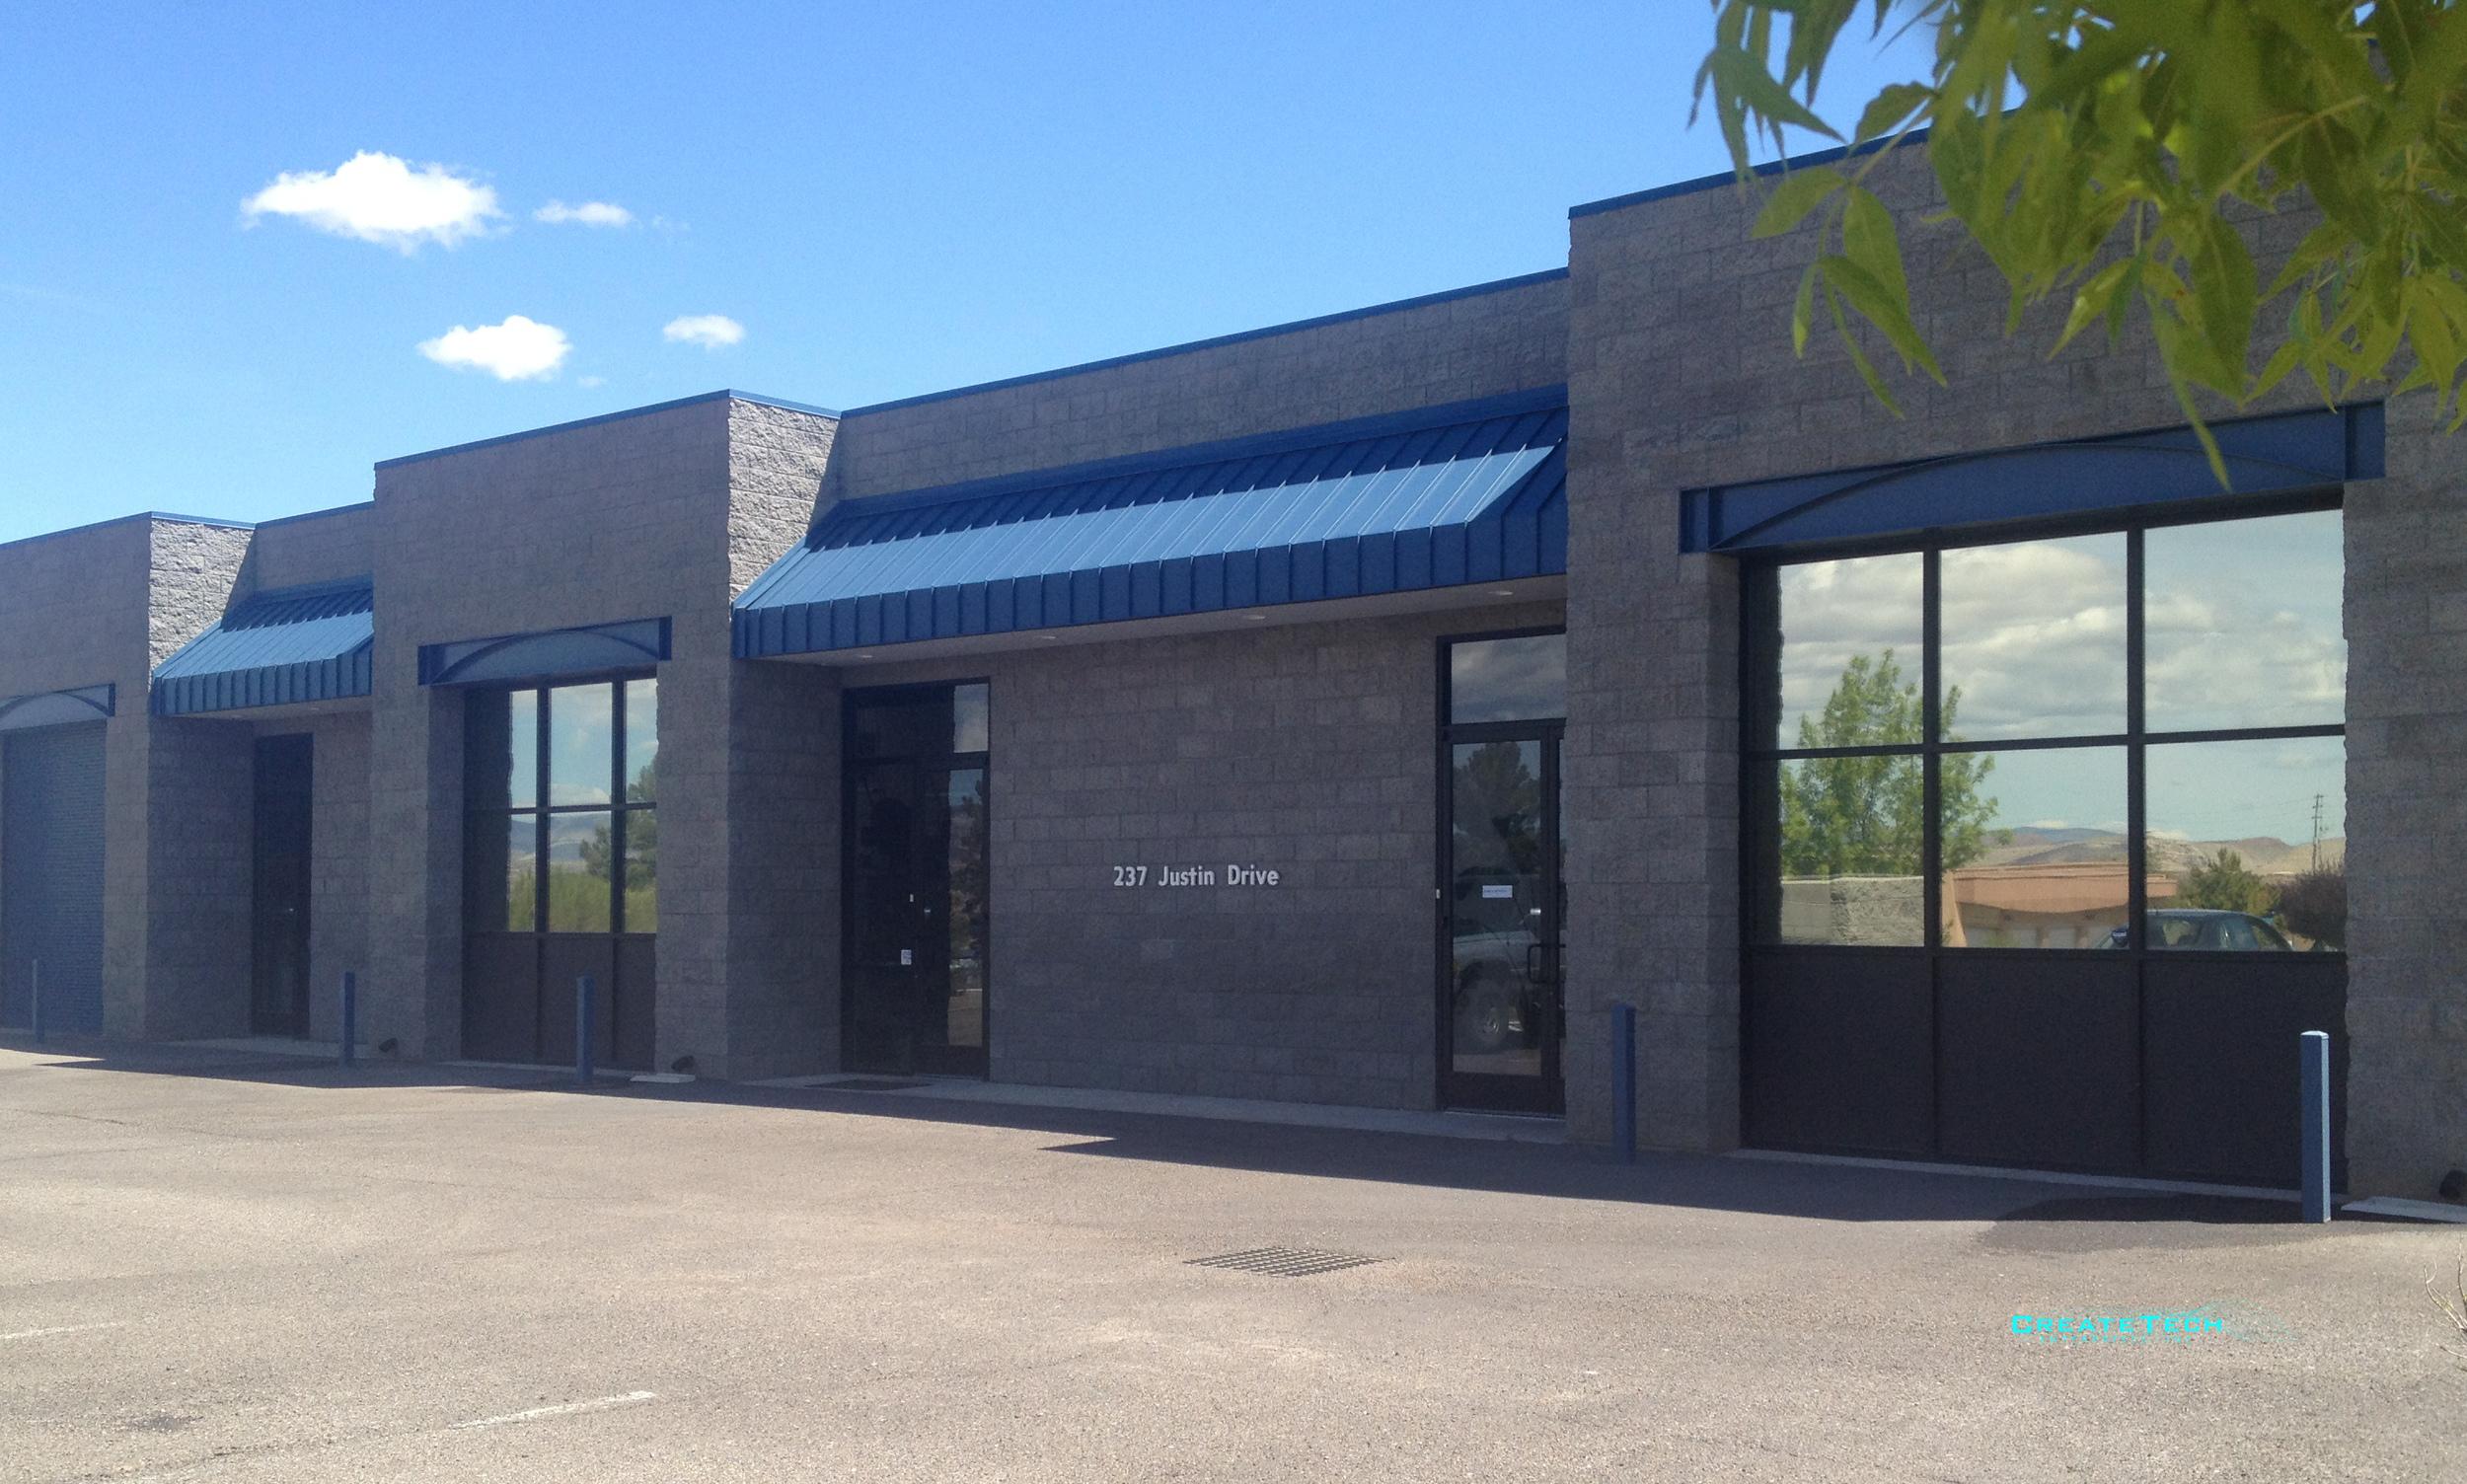 CreateTech Facility 237 Justin Dr. Cottonwood AZ, 86326